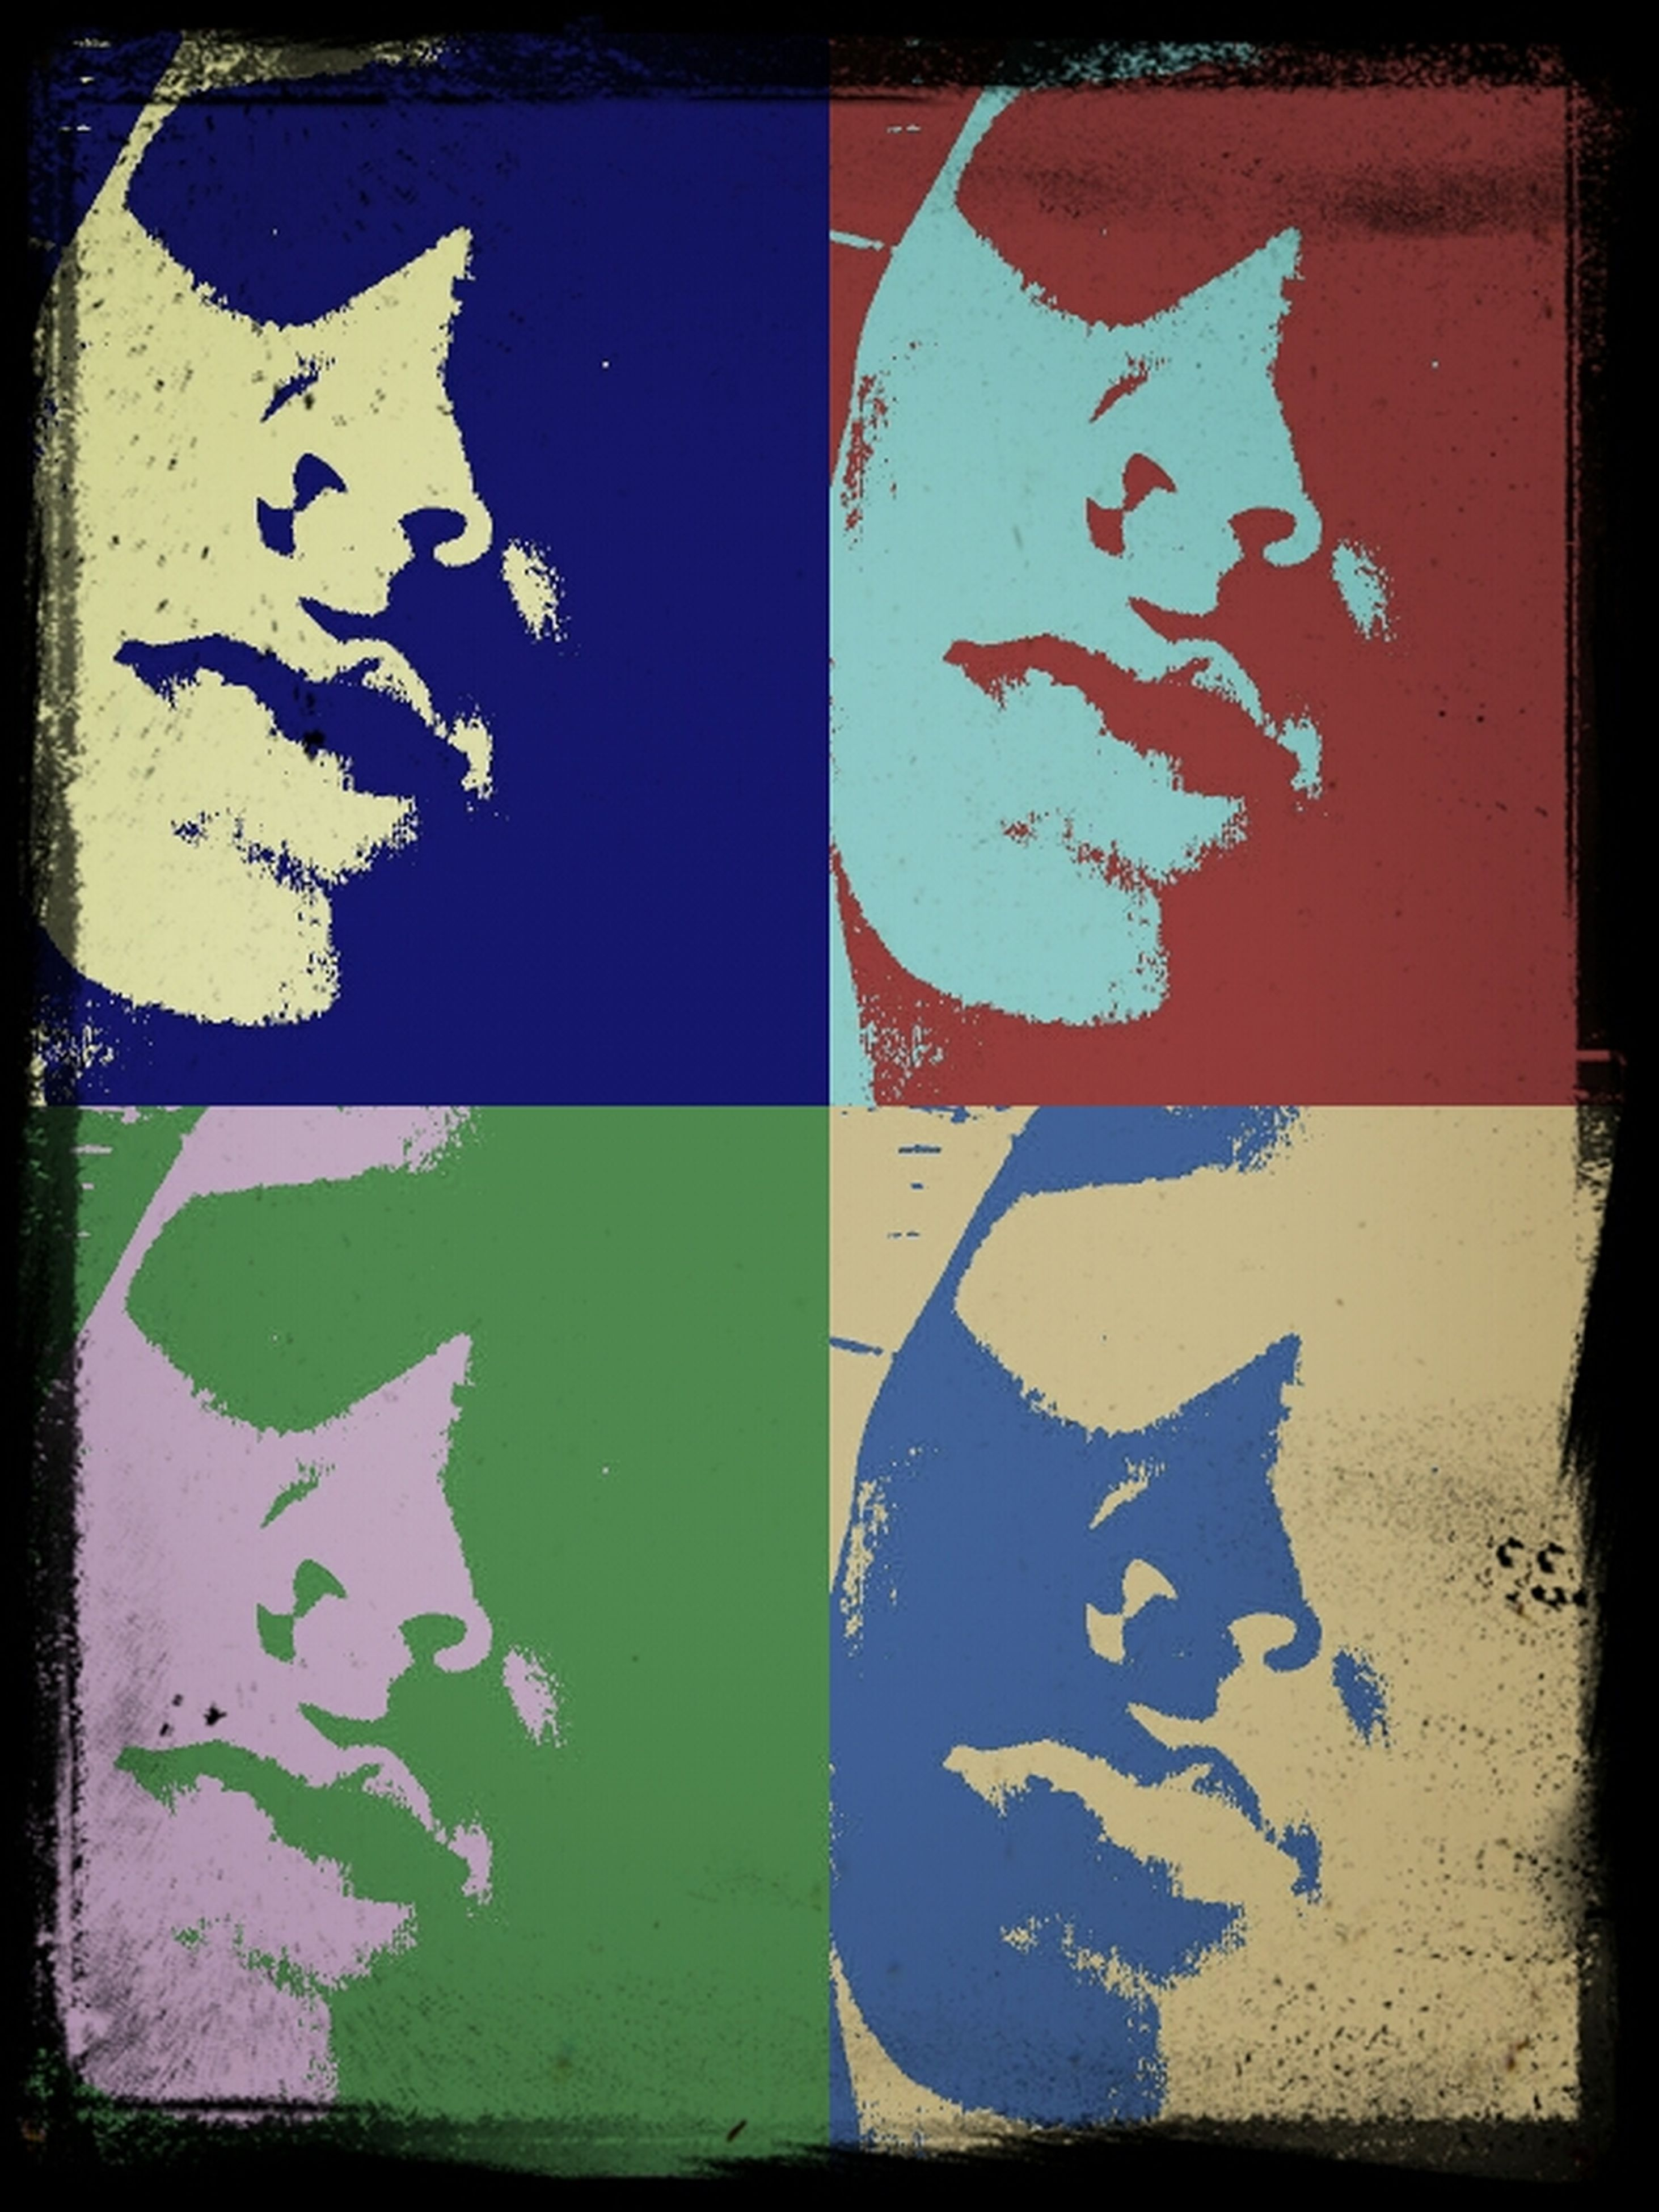 creativity, art, art and craft, transfer print, graffiti, auto post production filter, wall - building feature, text, close-up, western script, textured, wall, human representation, paint, communication, animal representation, street art, painted, full frame, heart shape